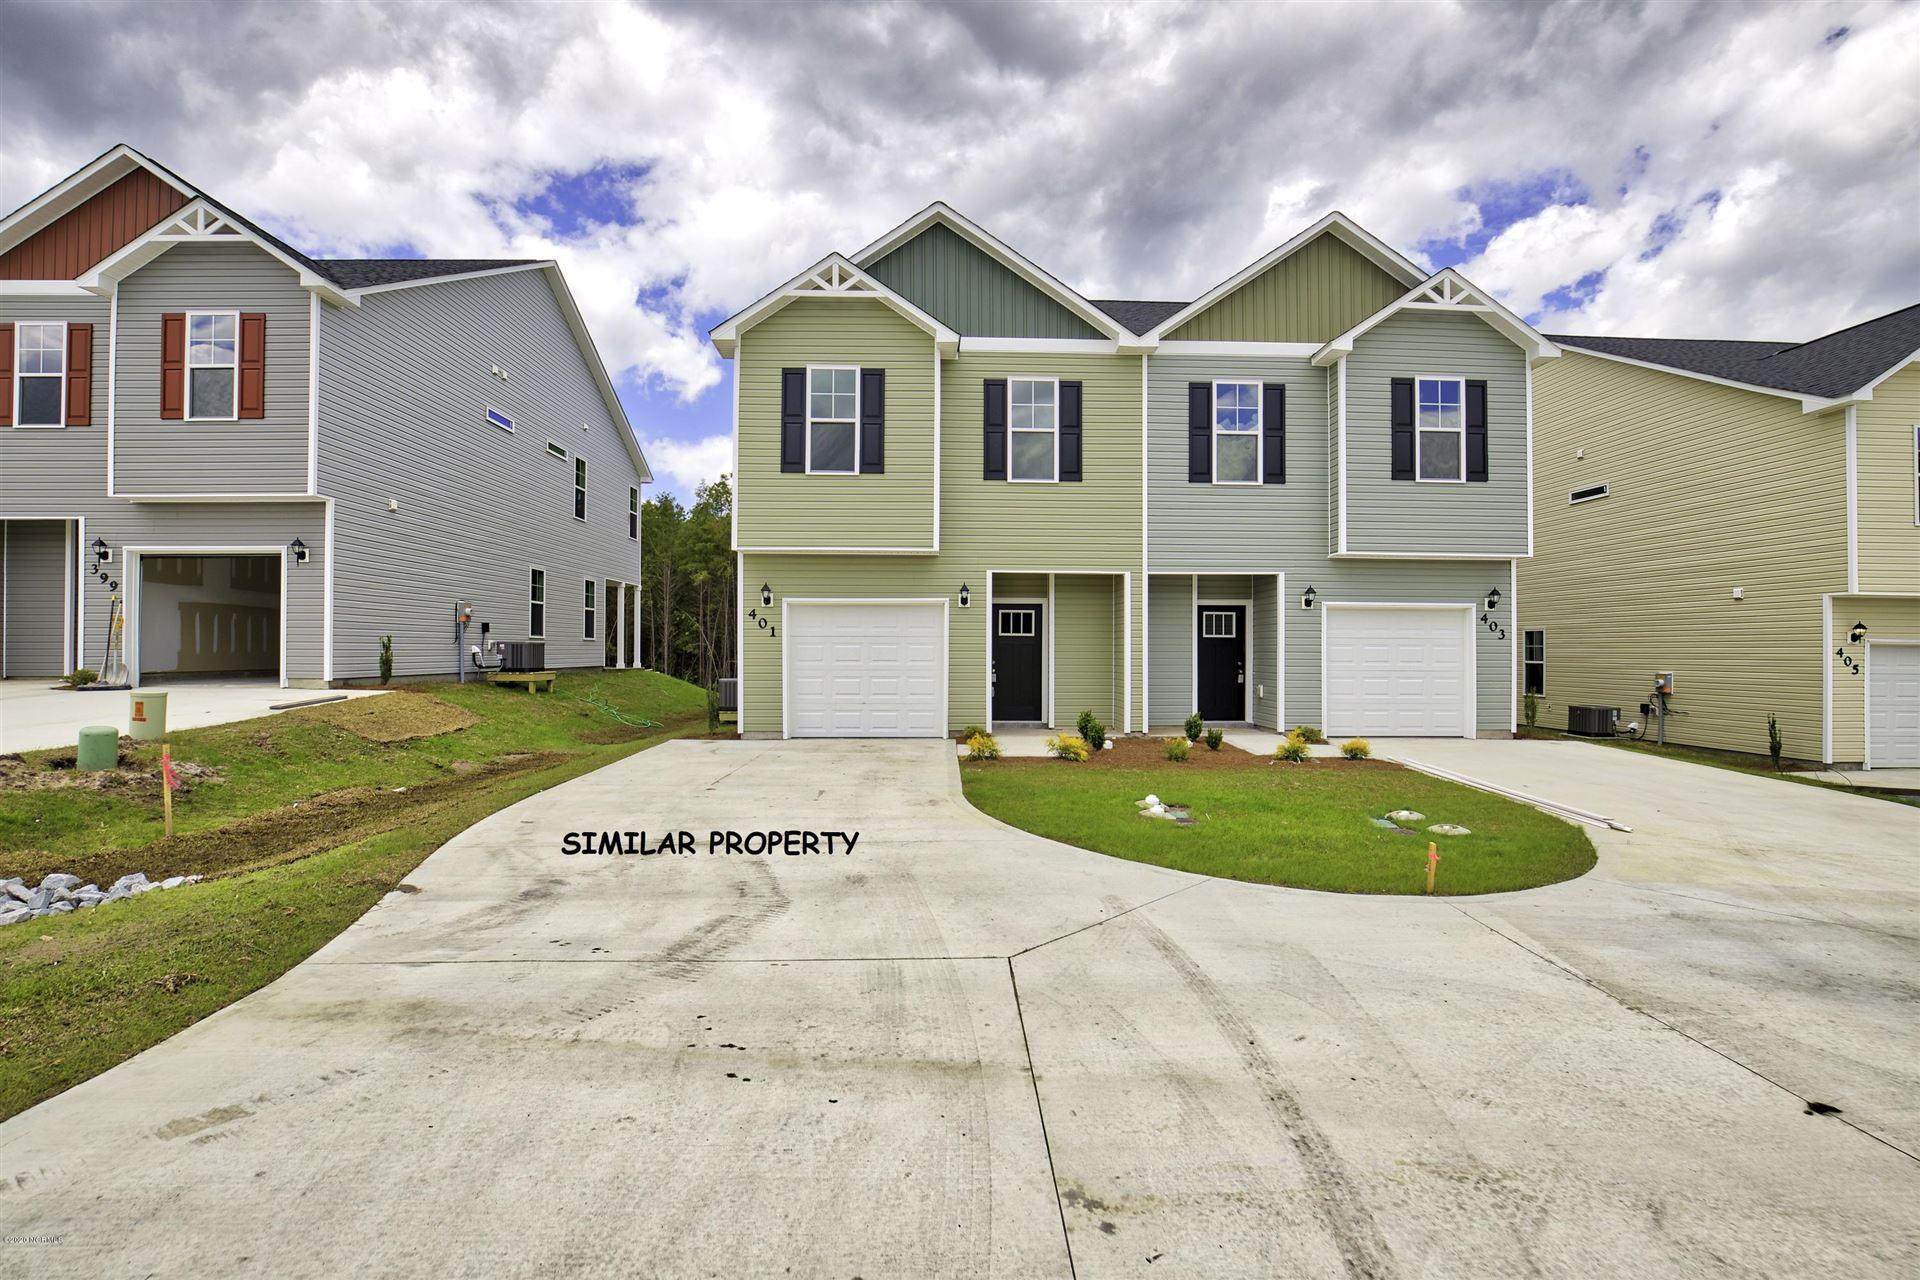 Photo of 405 Vandemere Court, Holly Ridge, NC 28445 (MLS # 100264105)